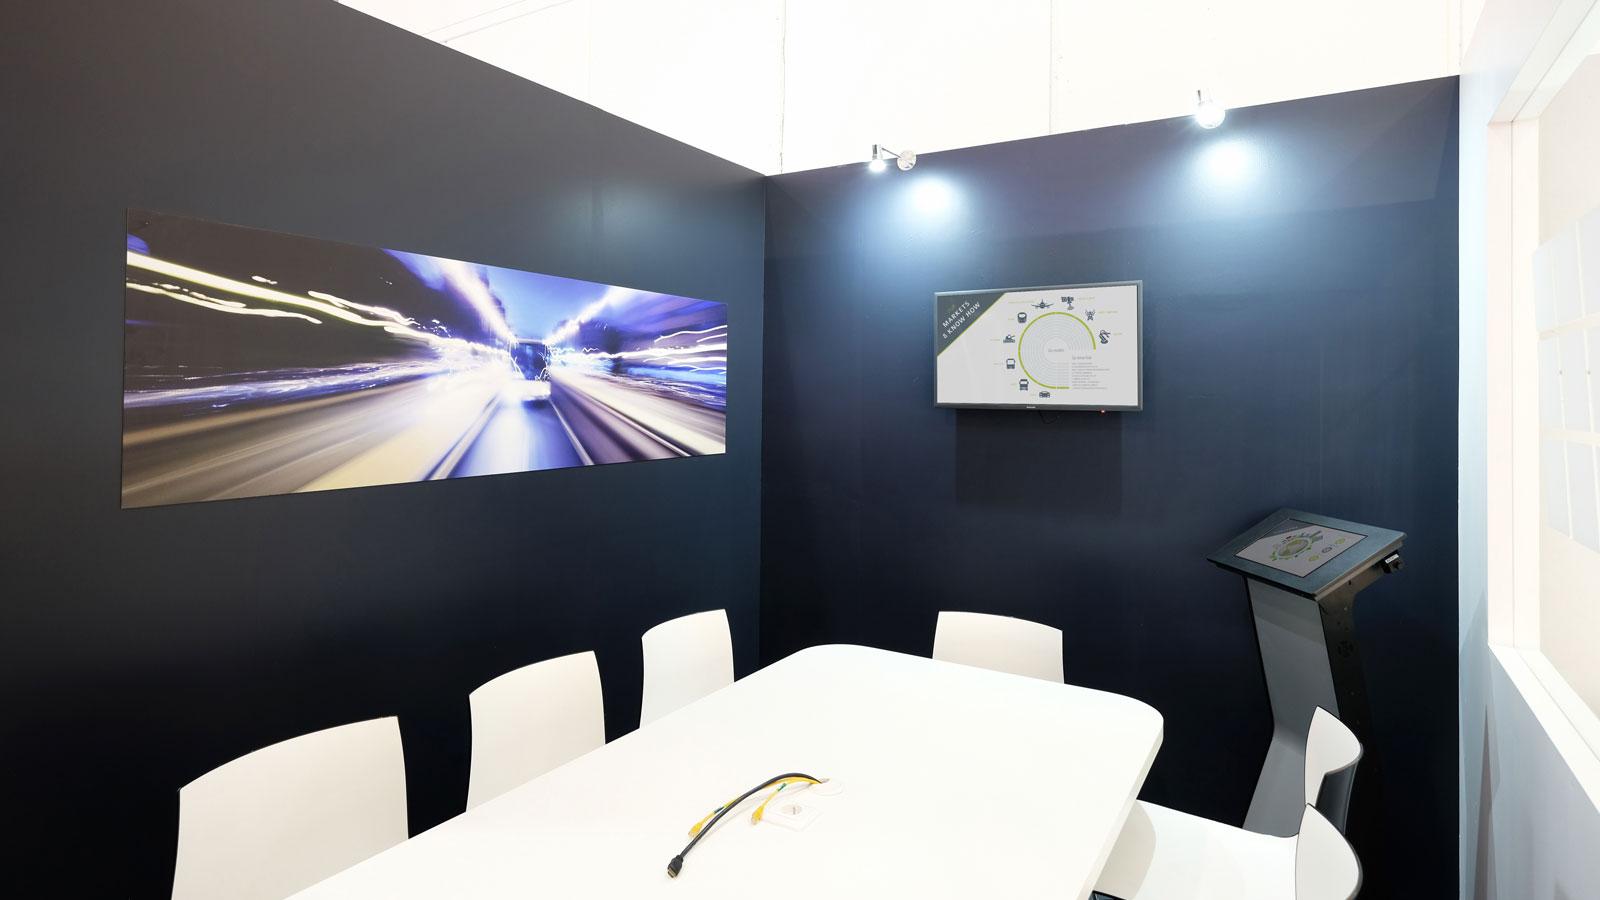 Stand-Design-Actia-Busworld-Meeting-room